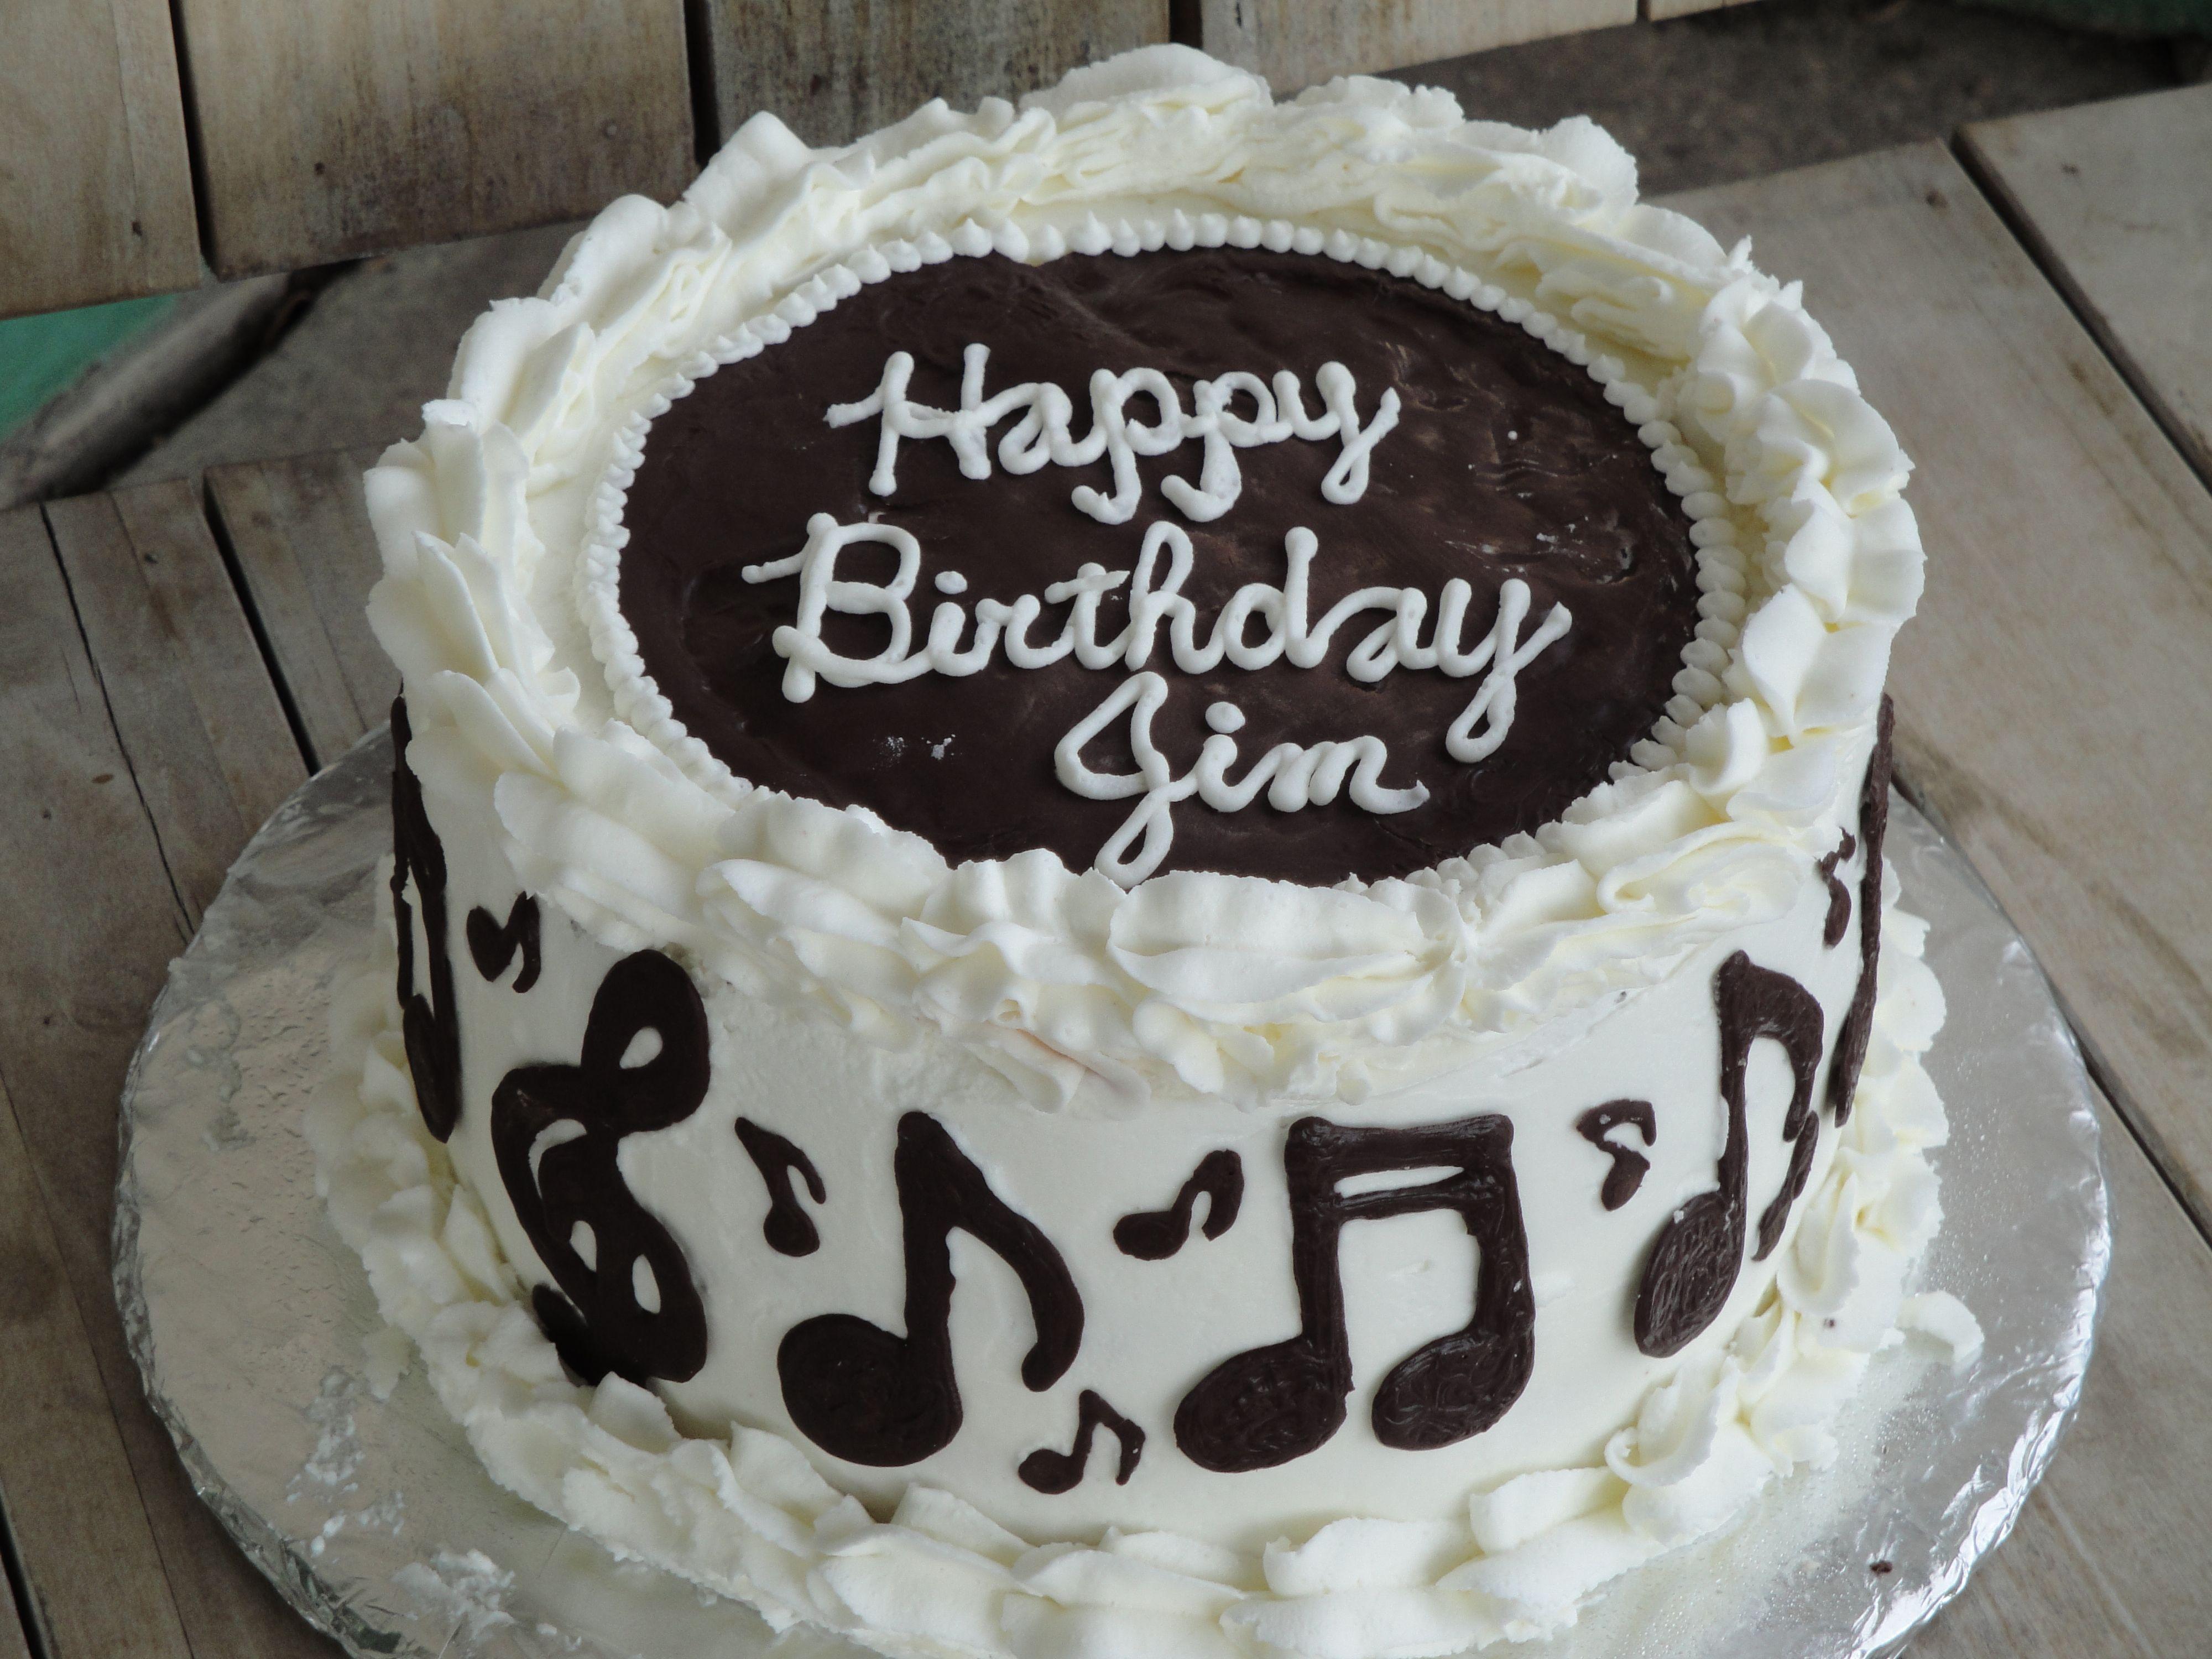 Jim S Birthday Cake Just Chanel Pinterest Birthday Cakes